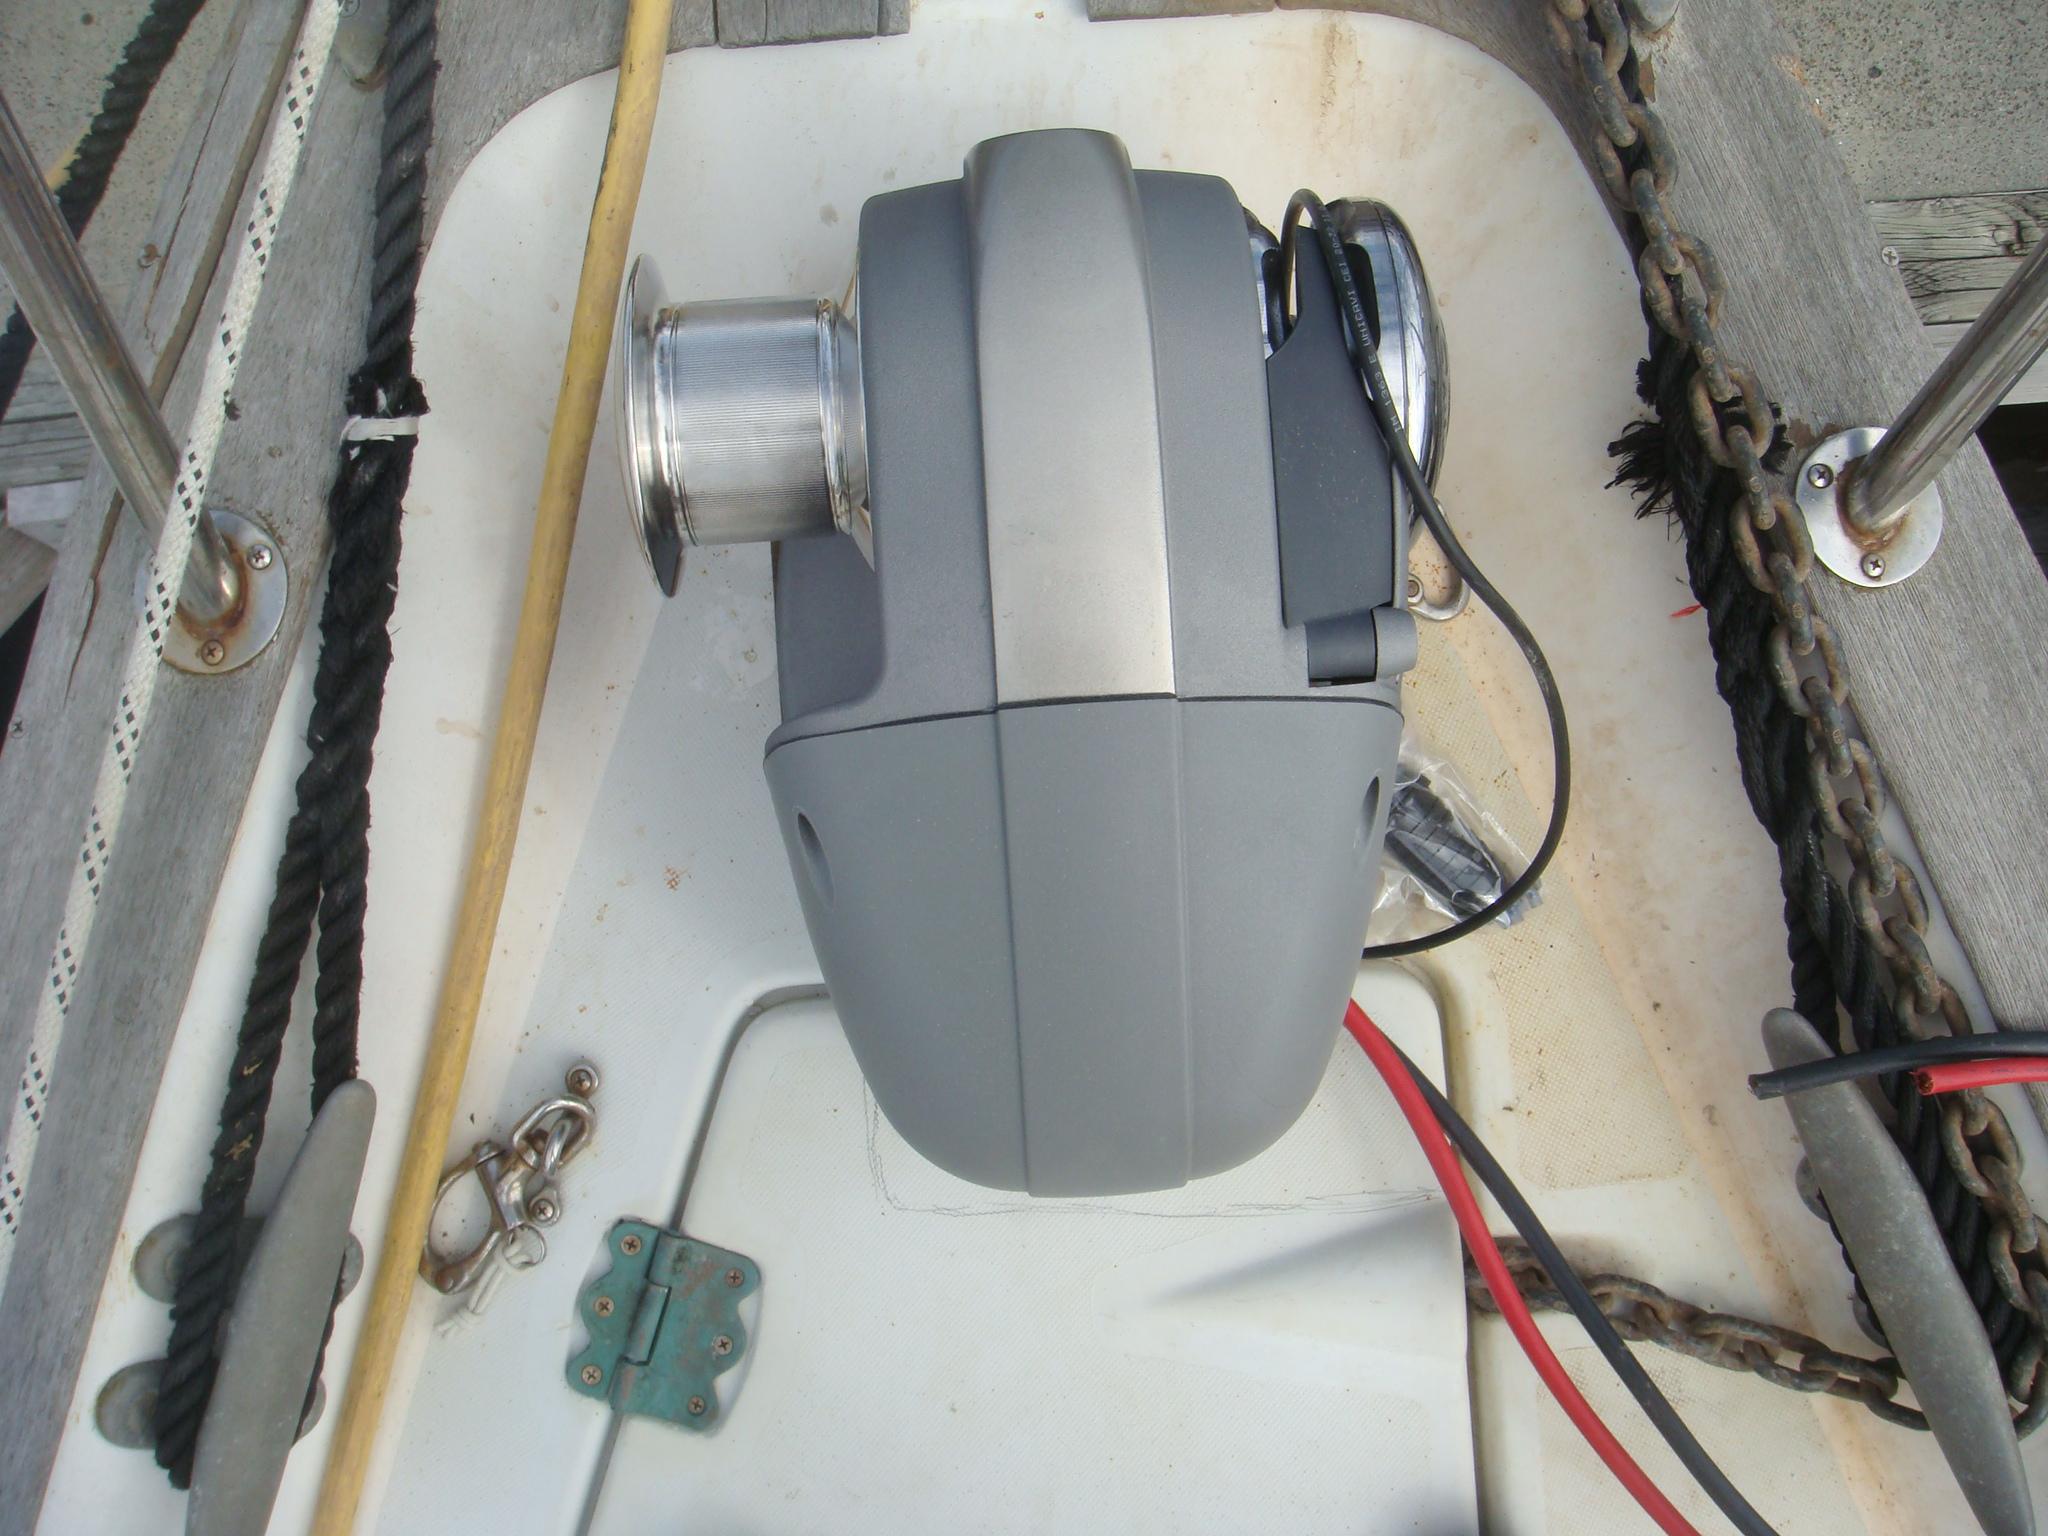 installing a quick windlass overhang on the anchor locker hatch